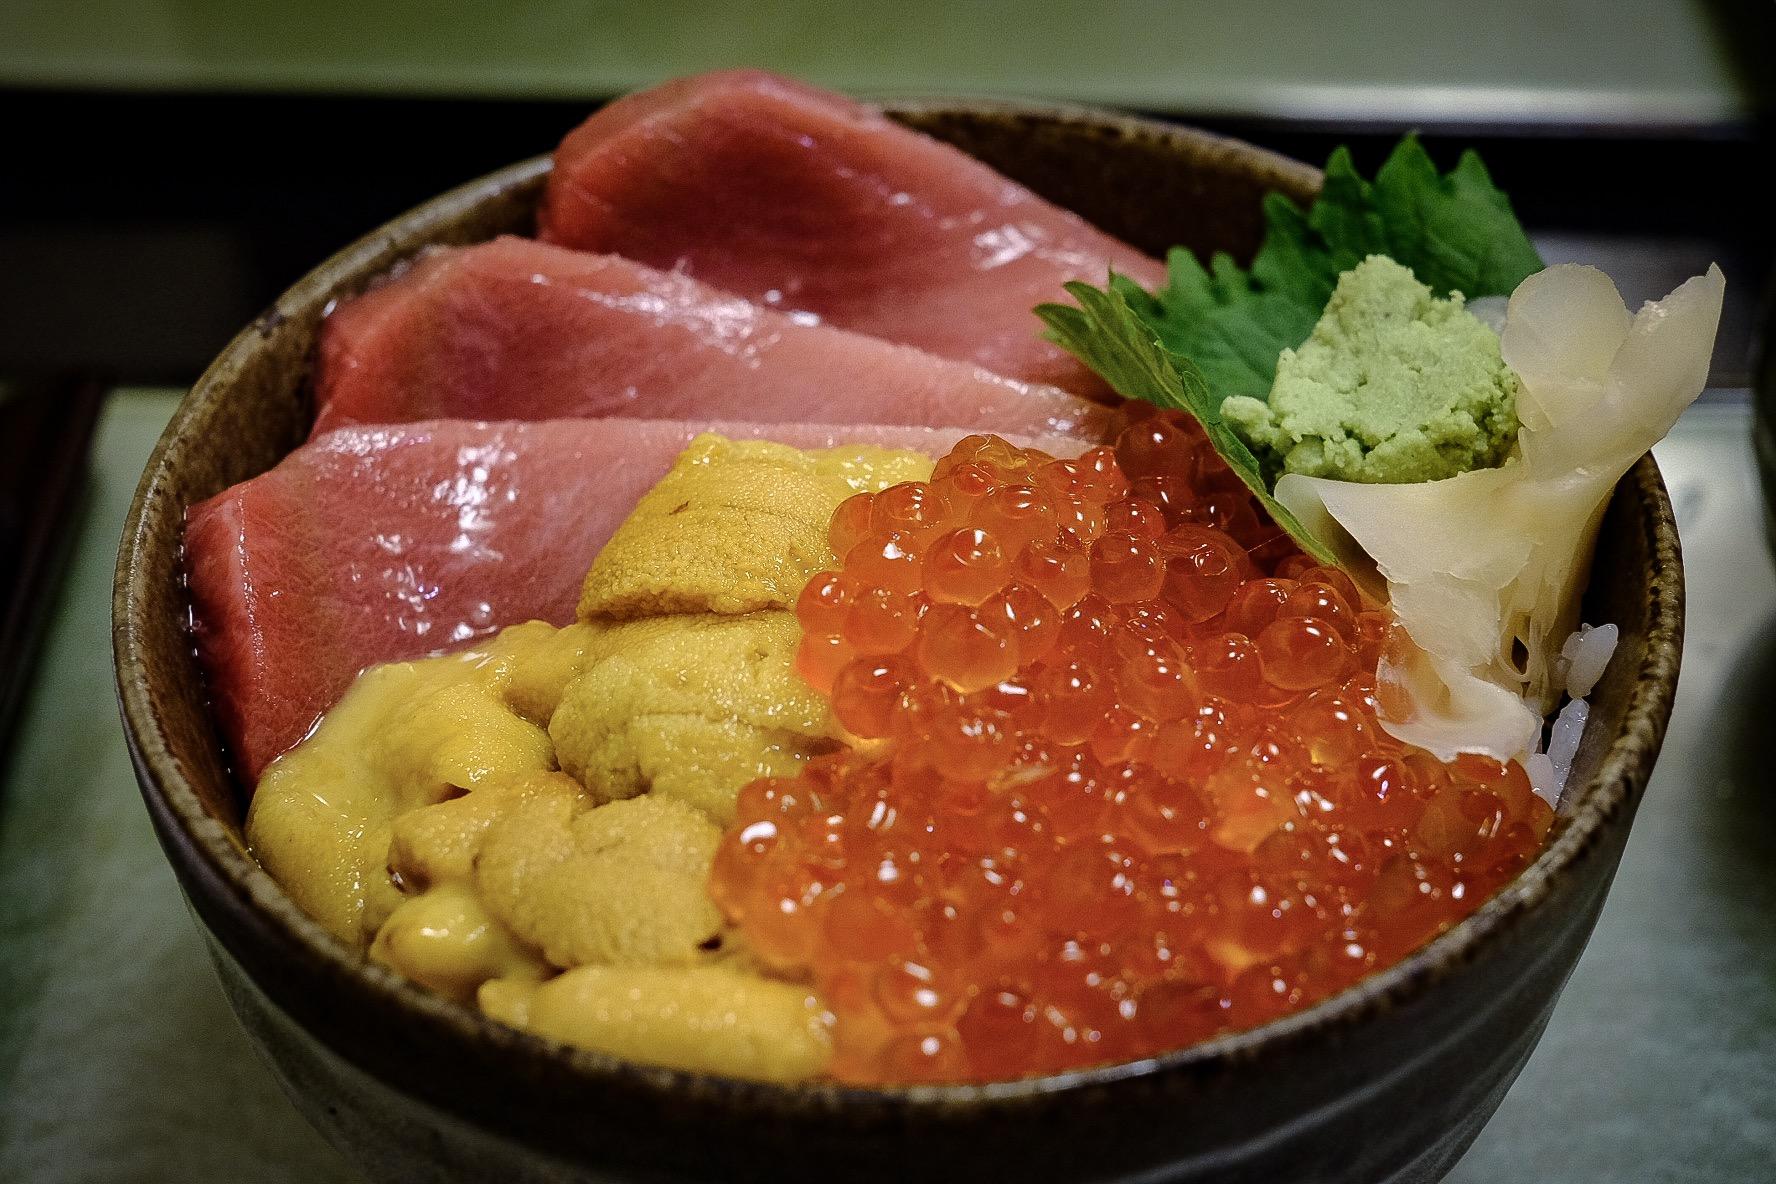 鮨國 - 築地/寿司 sushikuni uni rice bowl